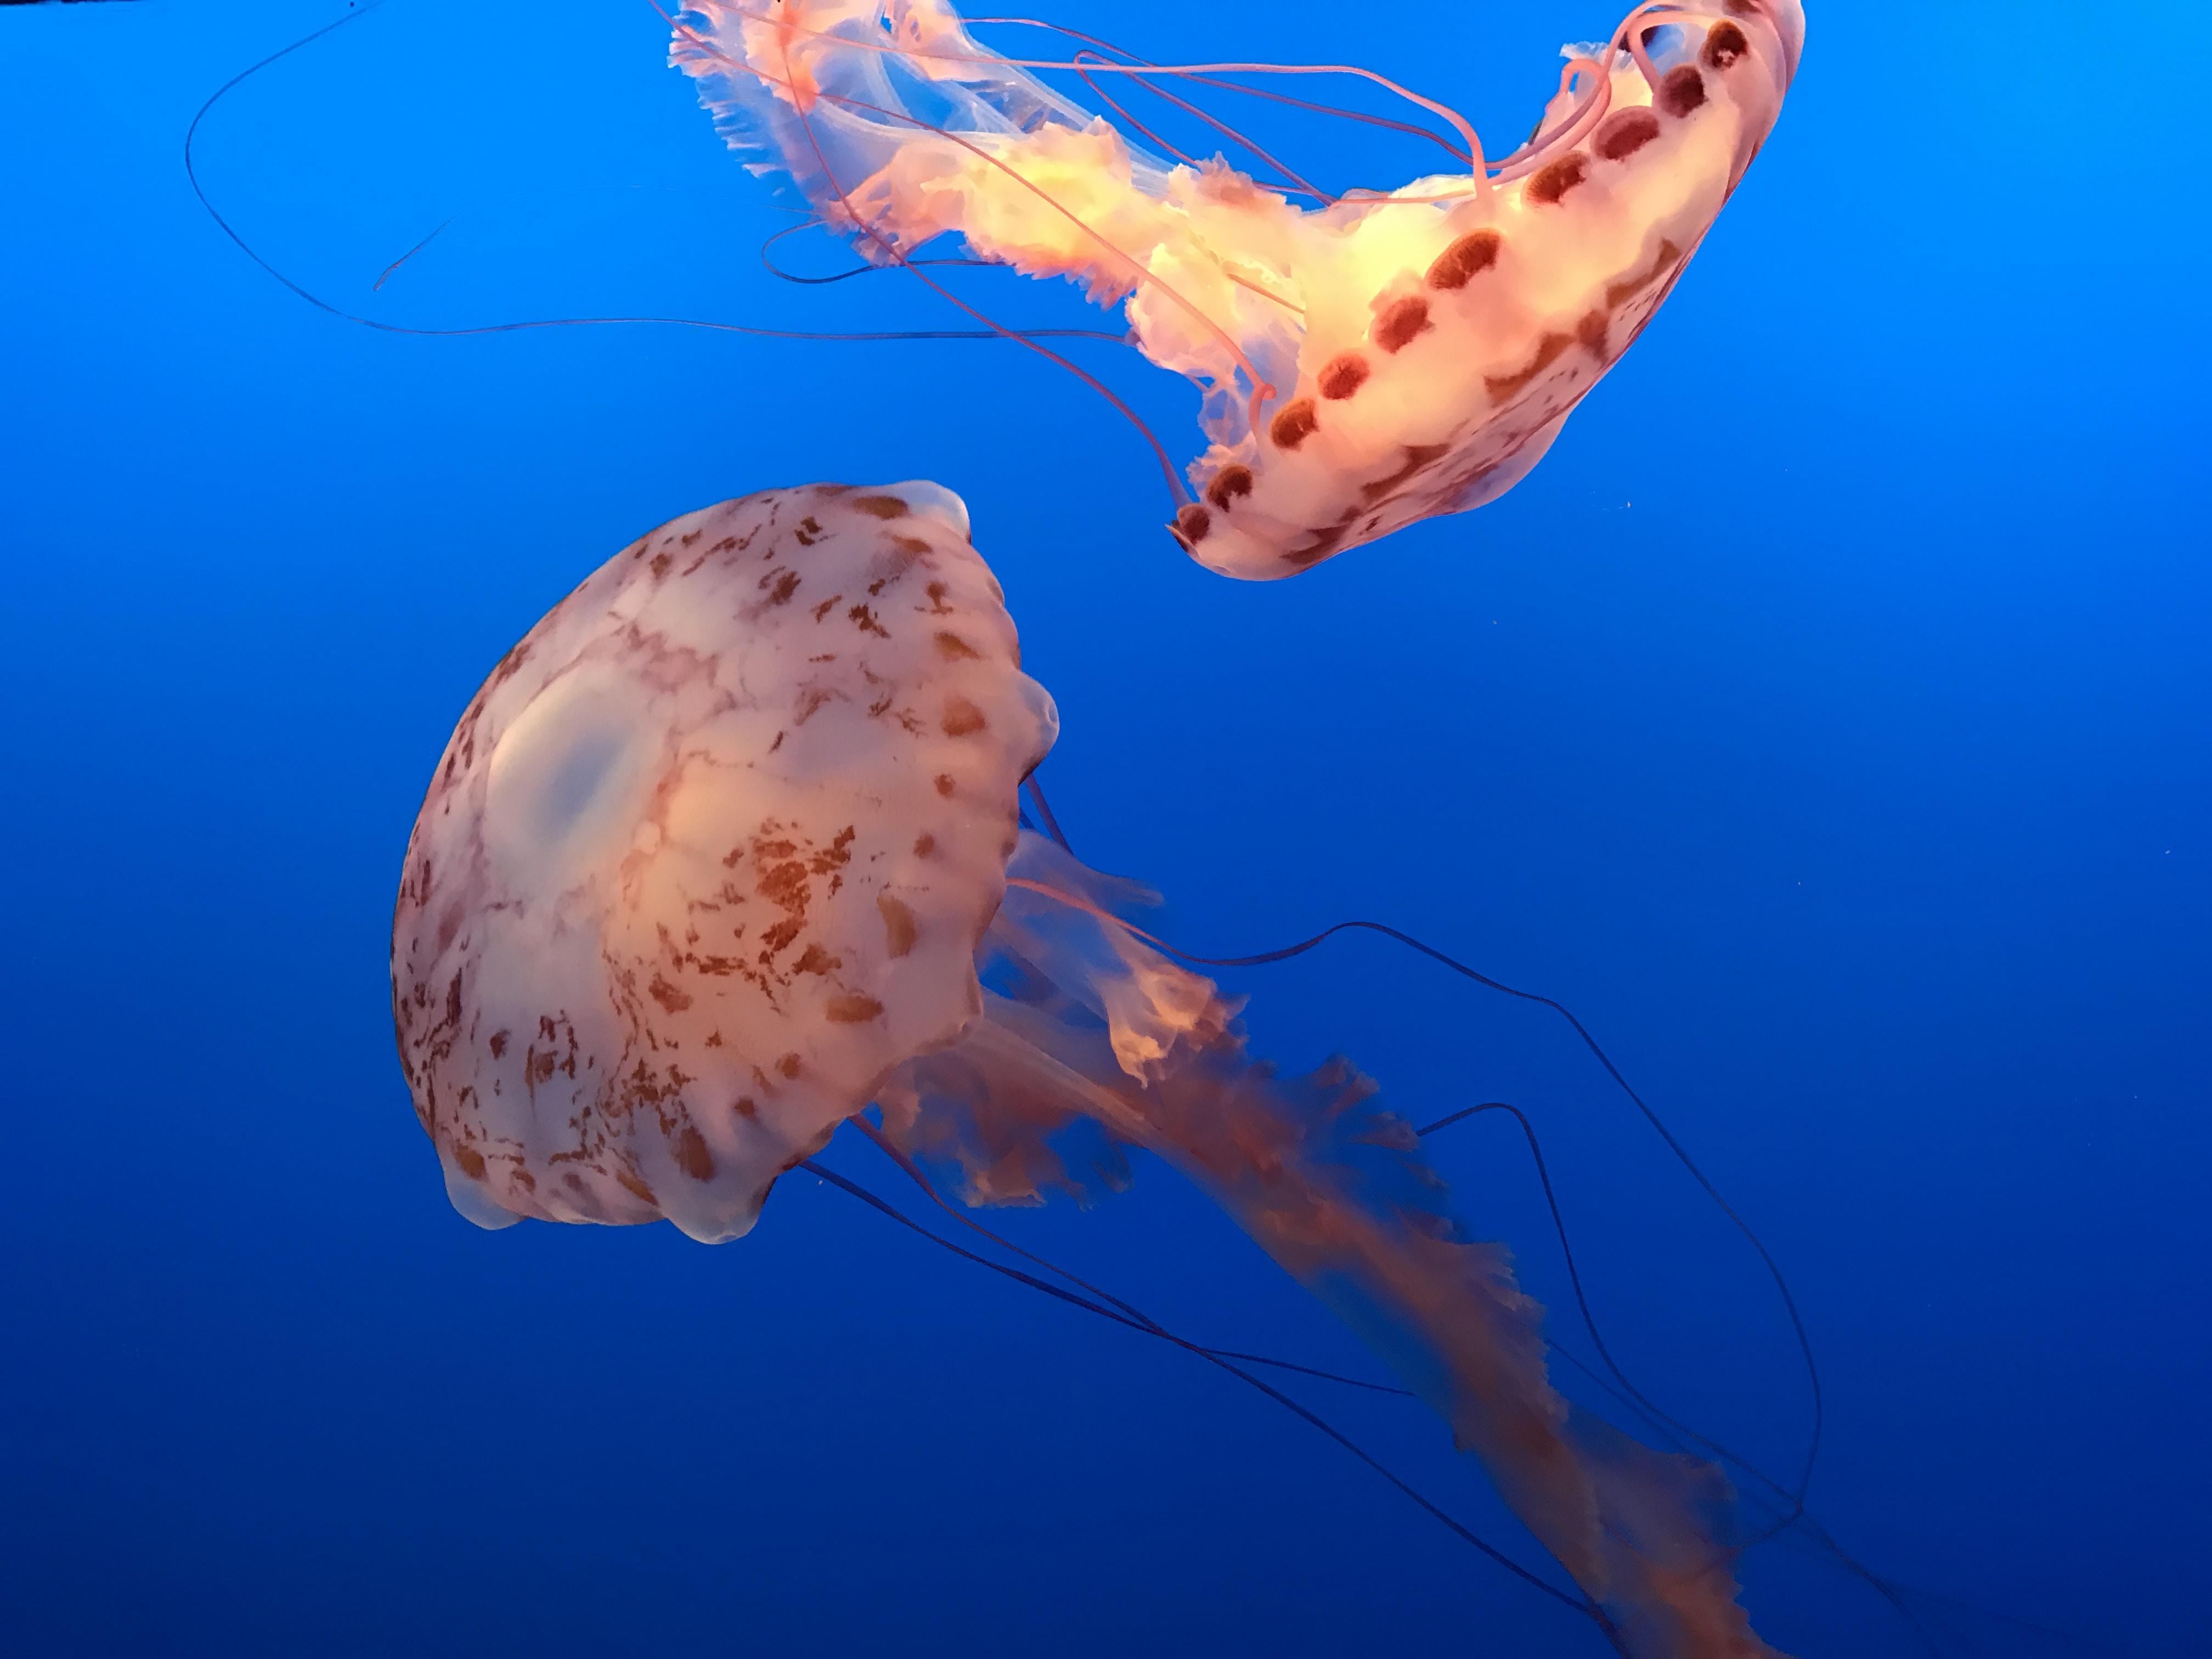 Delicate orange jelly fish swim gracefully in the blue ocean